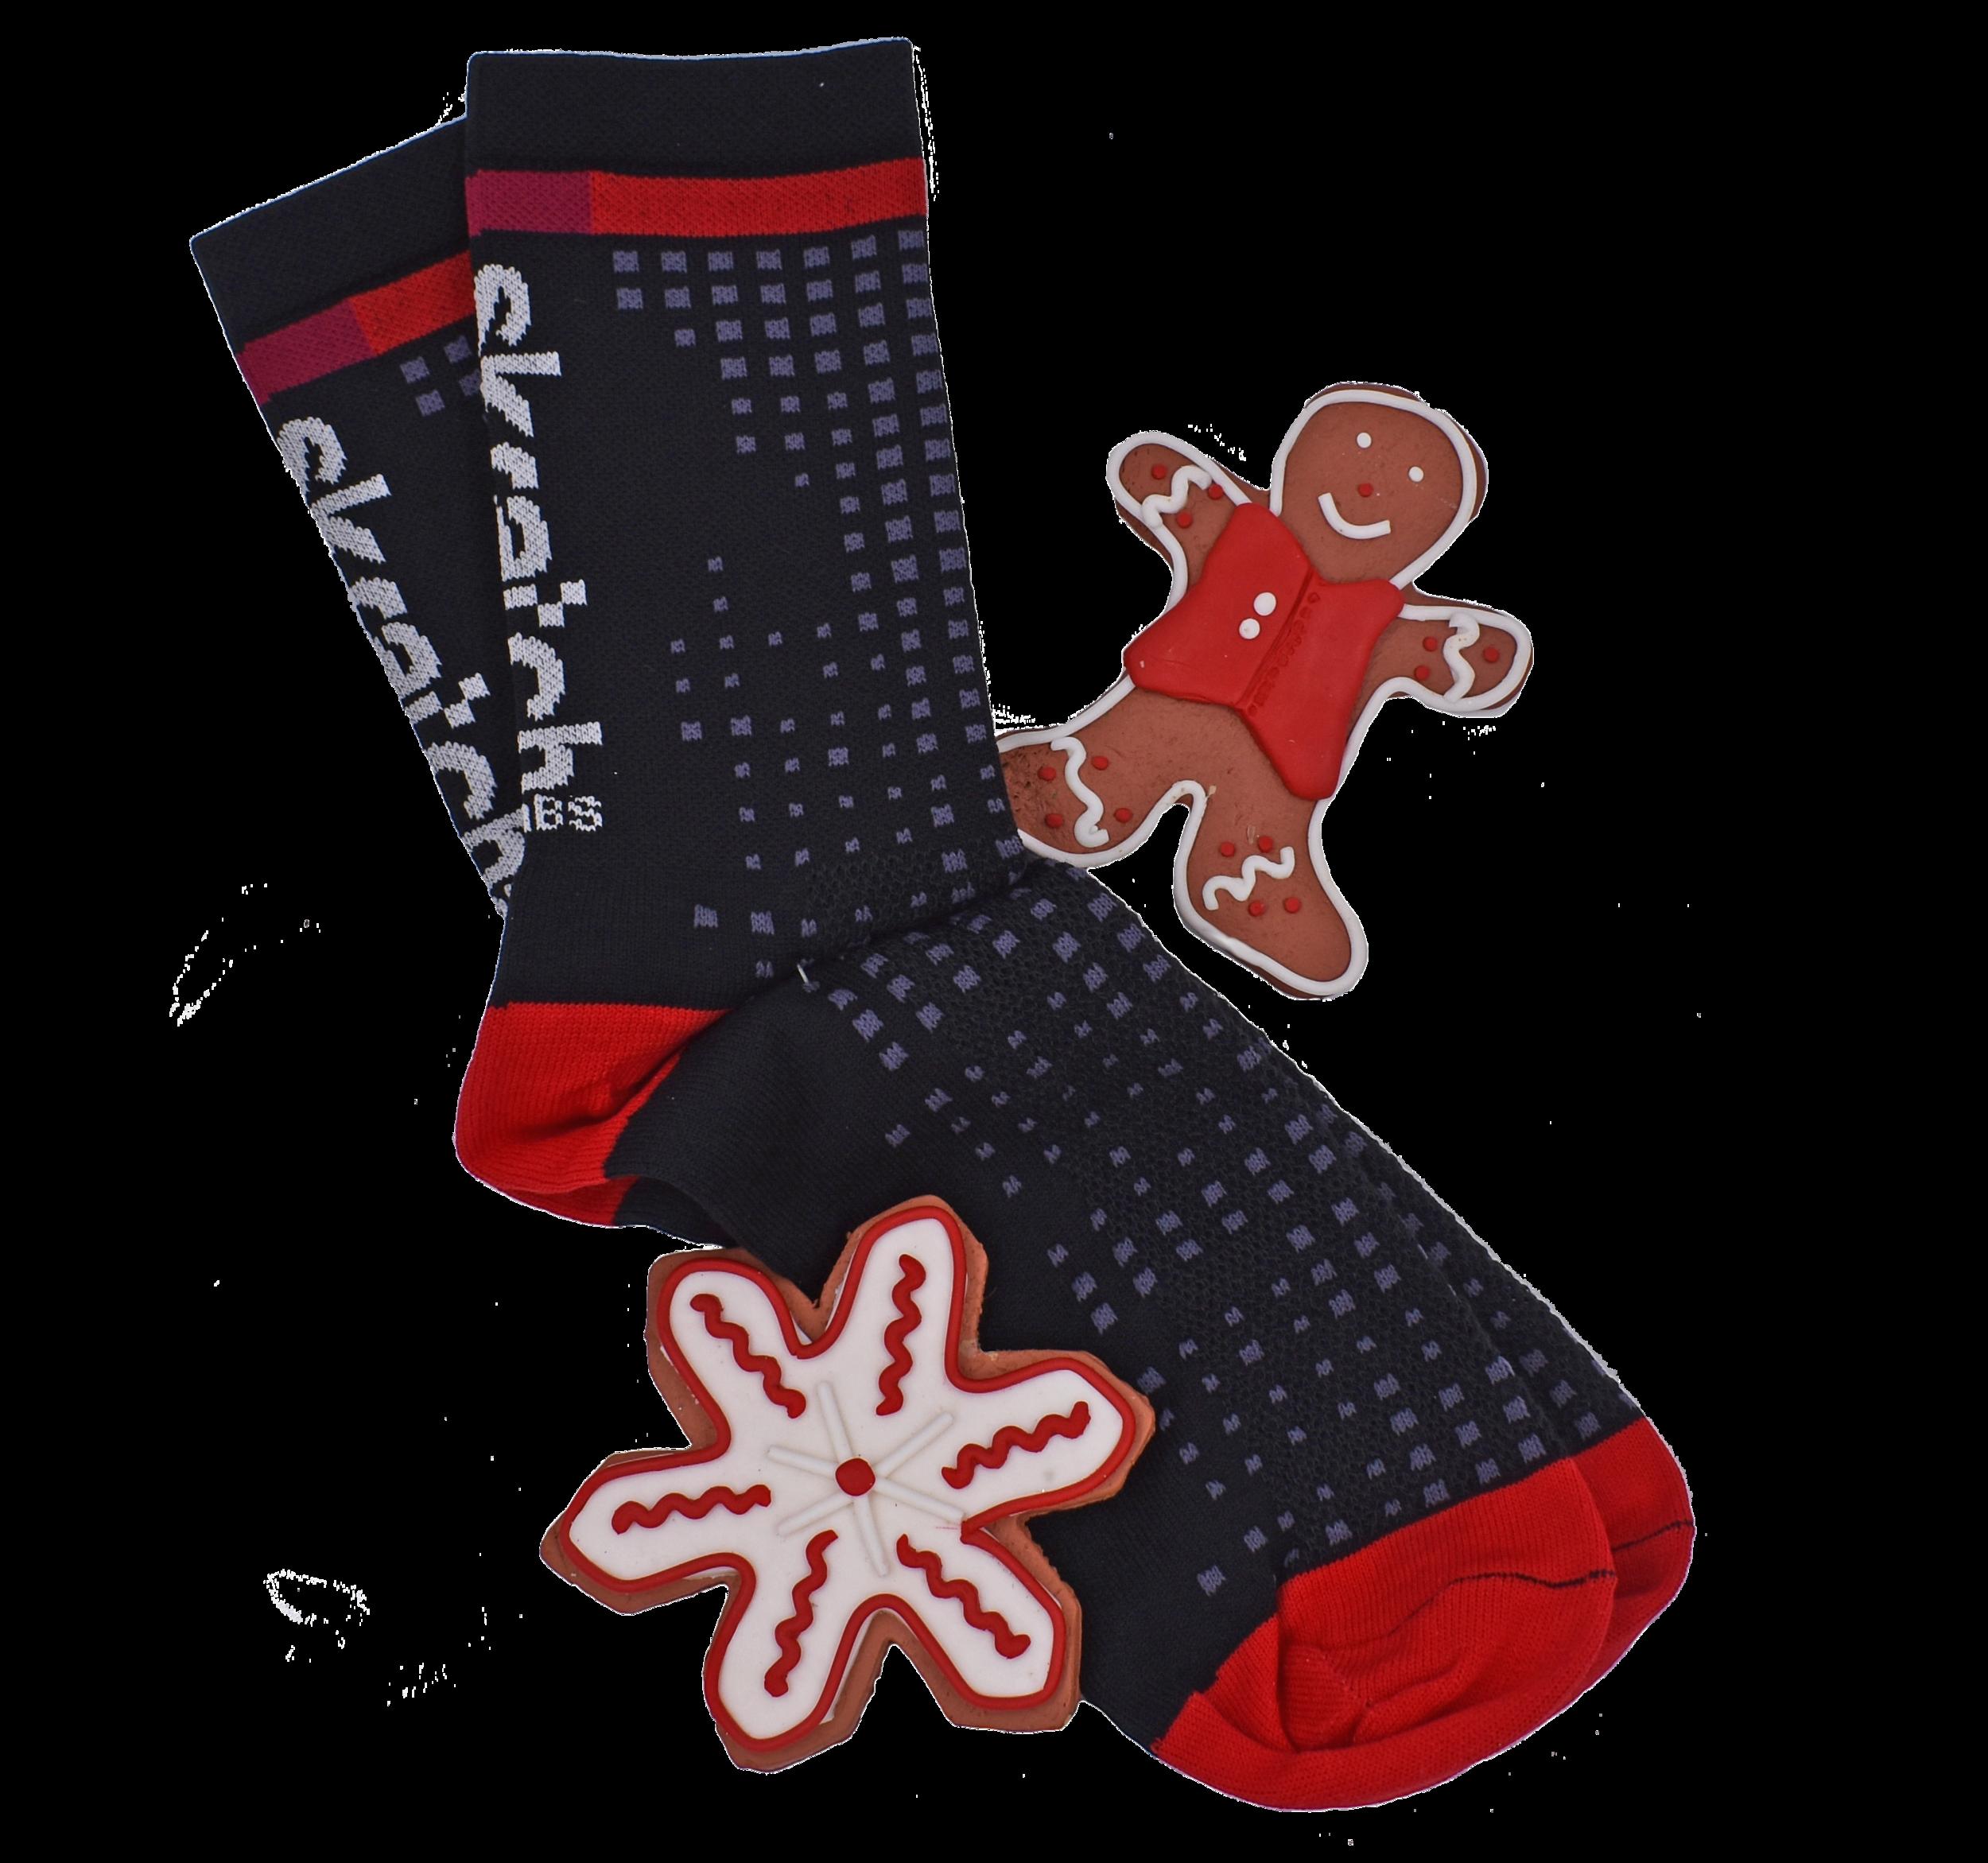 holiday-skratch-gift-socks.png